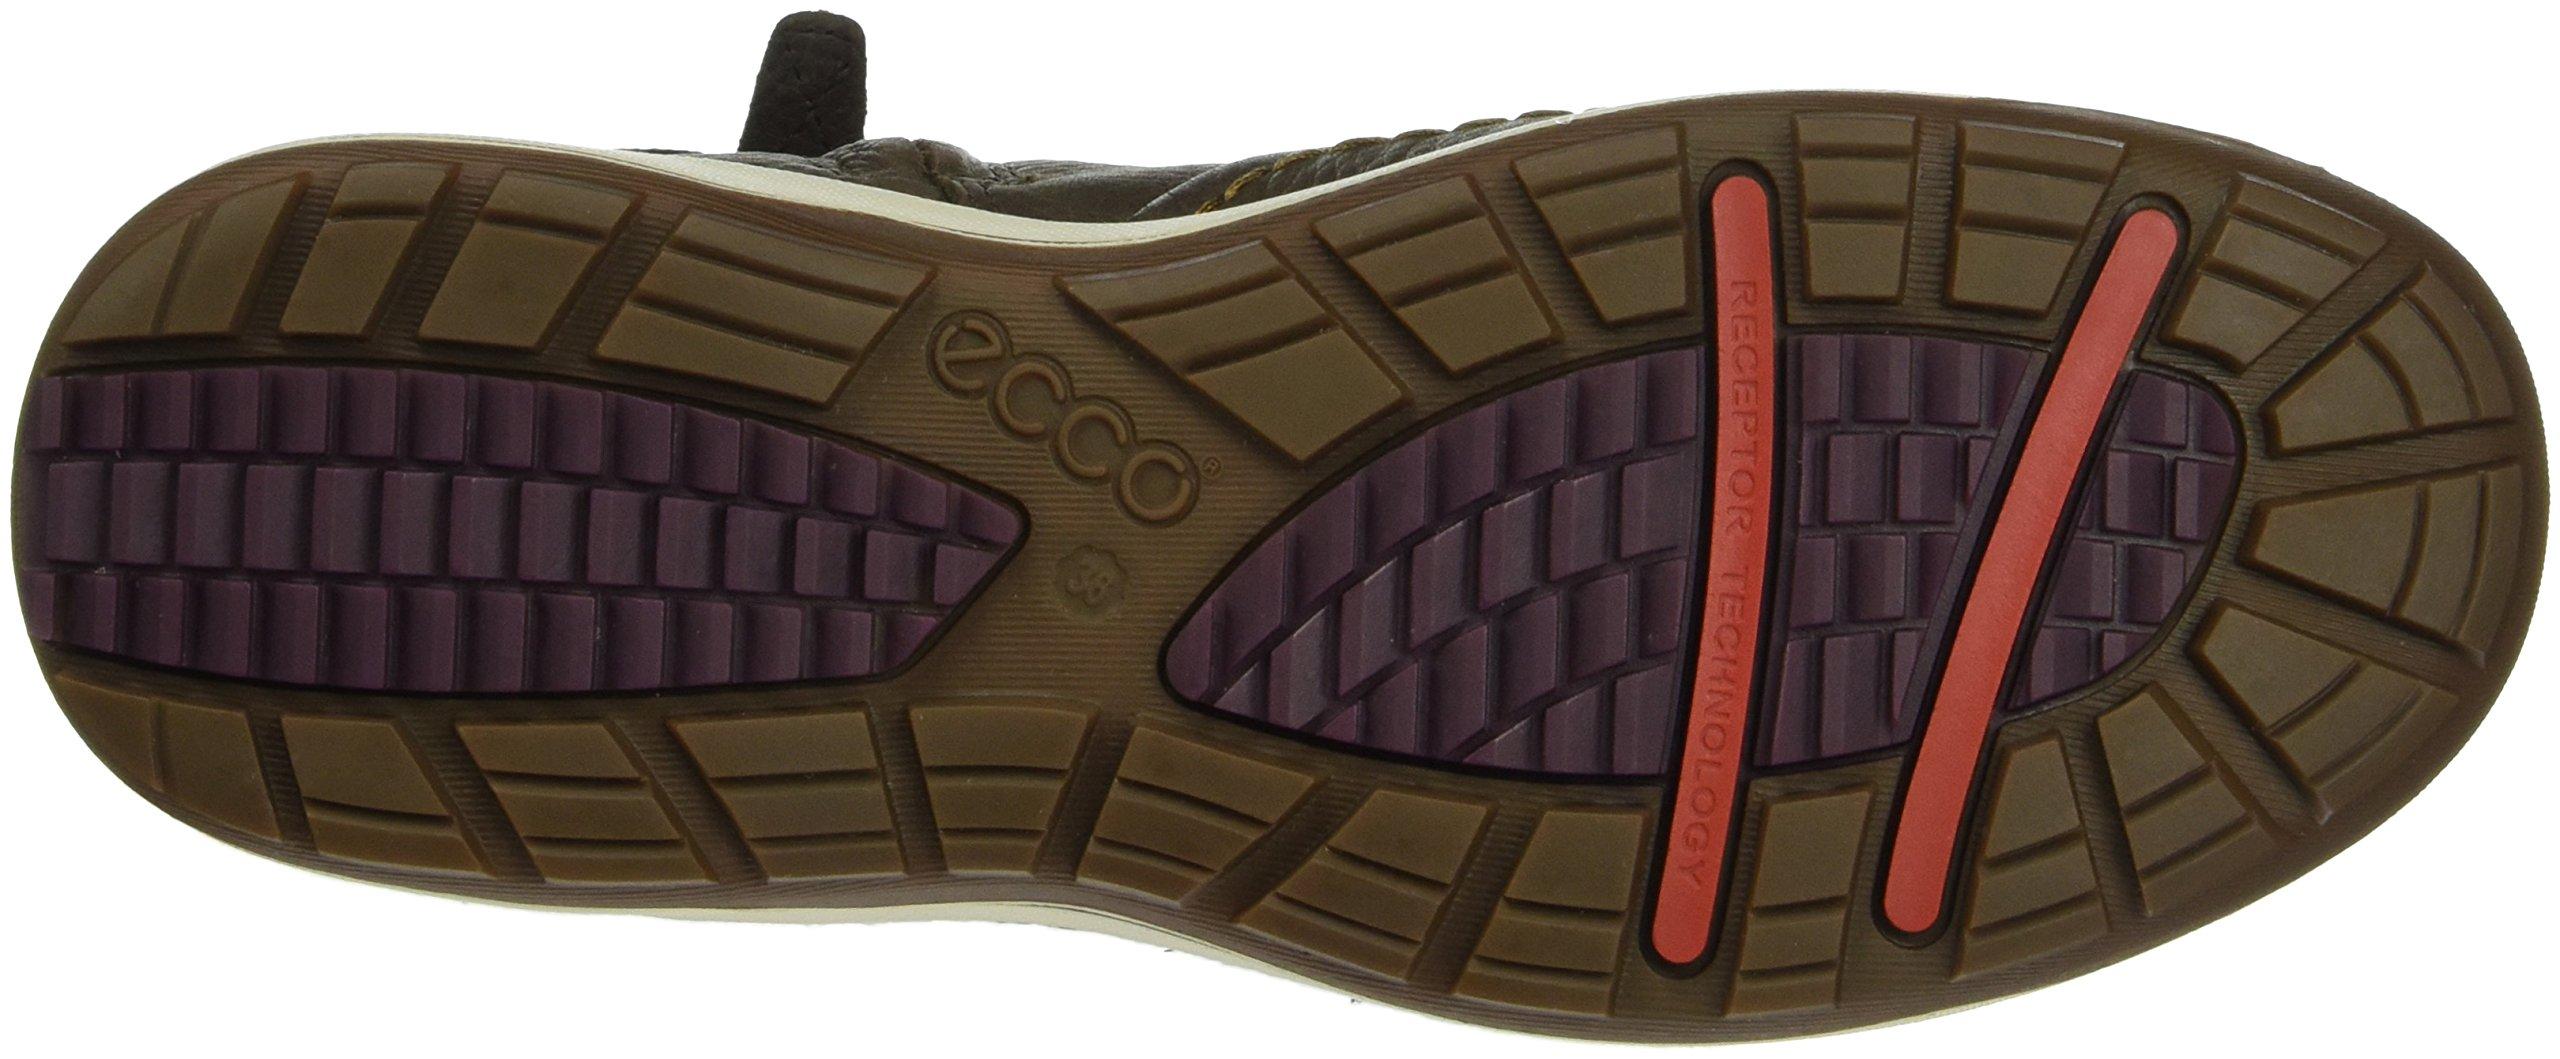 81R0s1rIoTL - ECCO Women's Trace Boot-w Multisport Outdoor Shoes